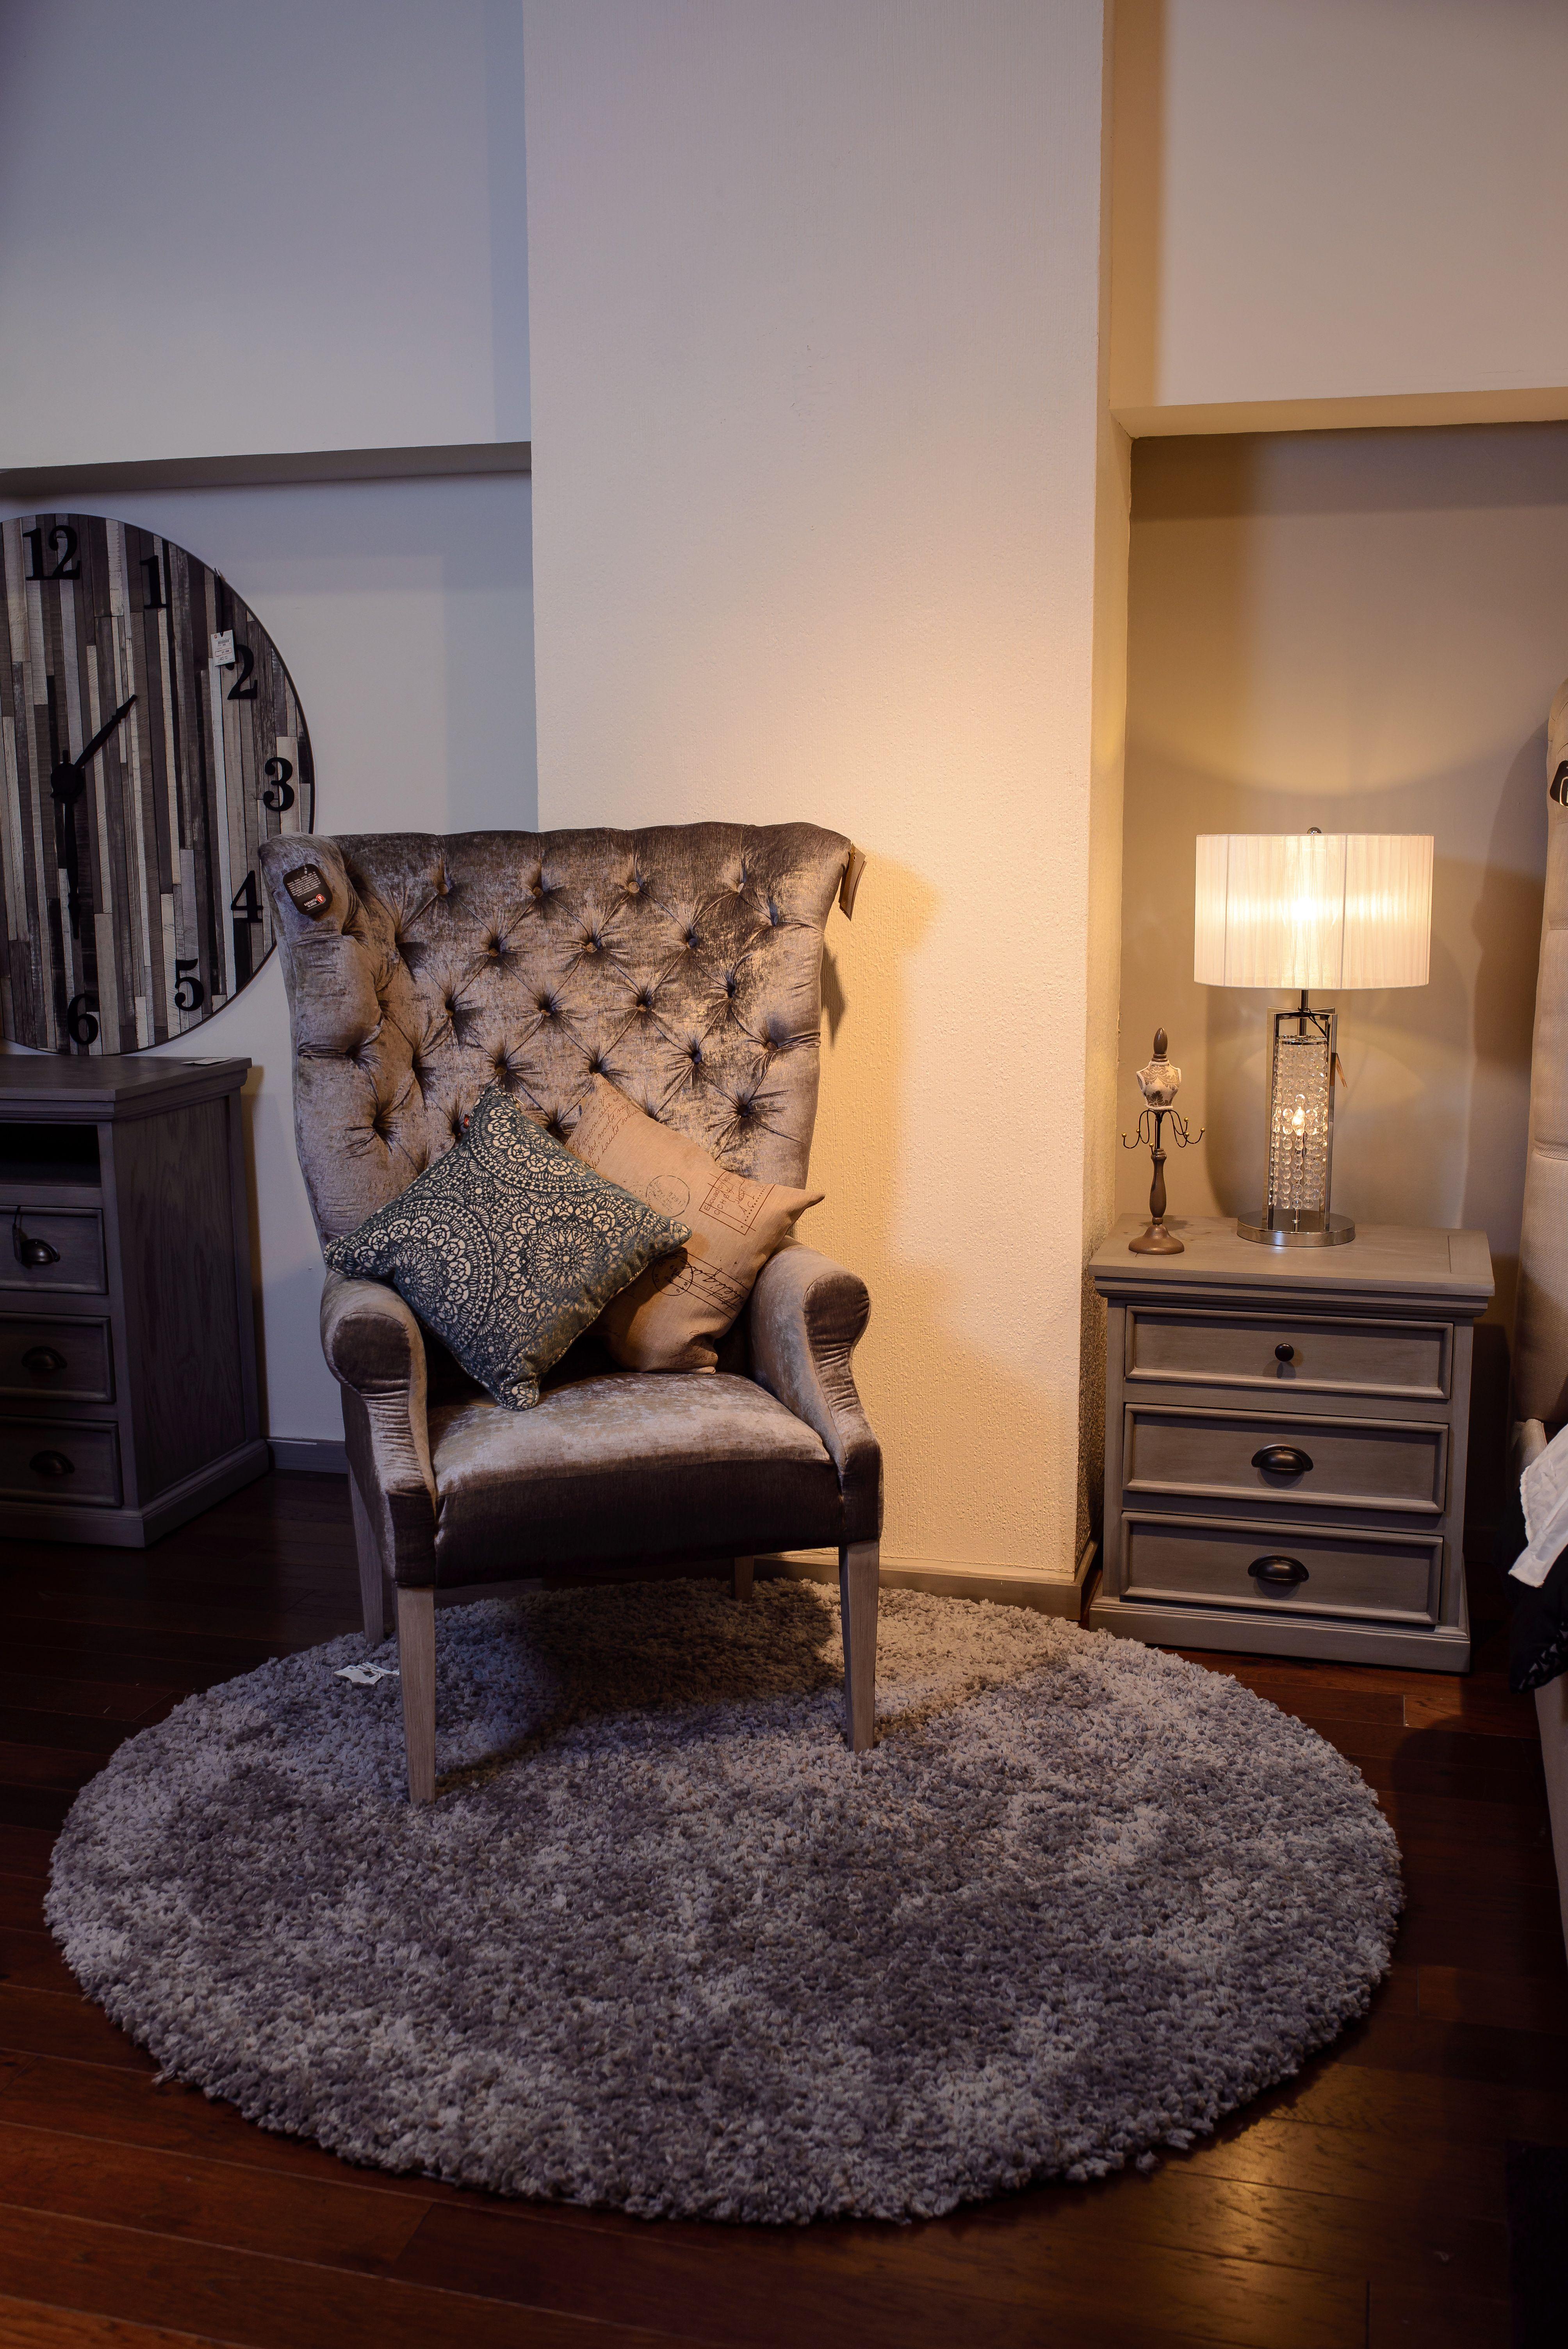 Pin De Placencia Muebles En Sillones Ocasionales Pinterest  # Muebles Ezquerro